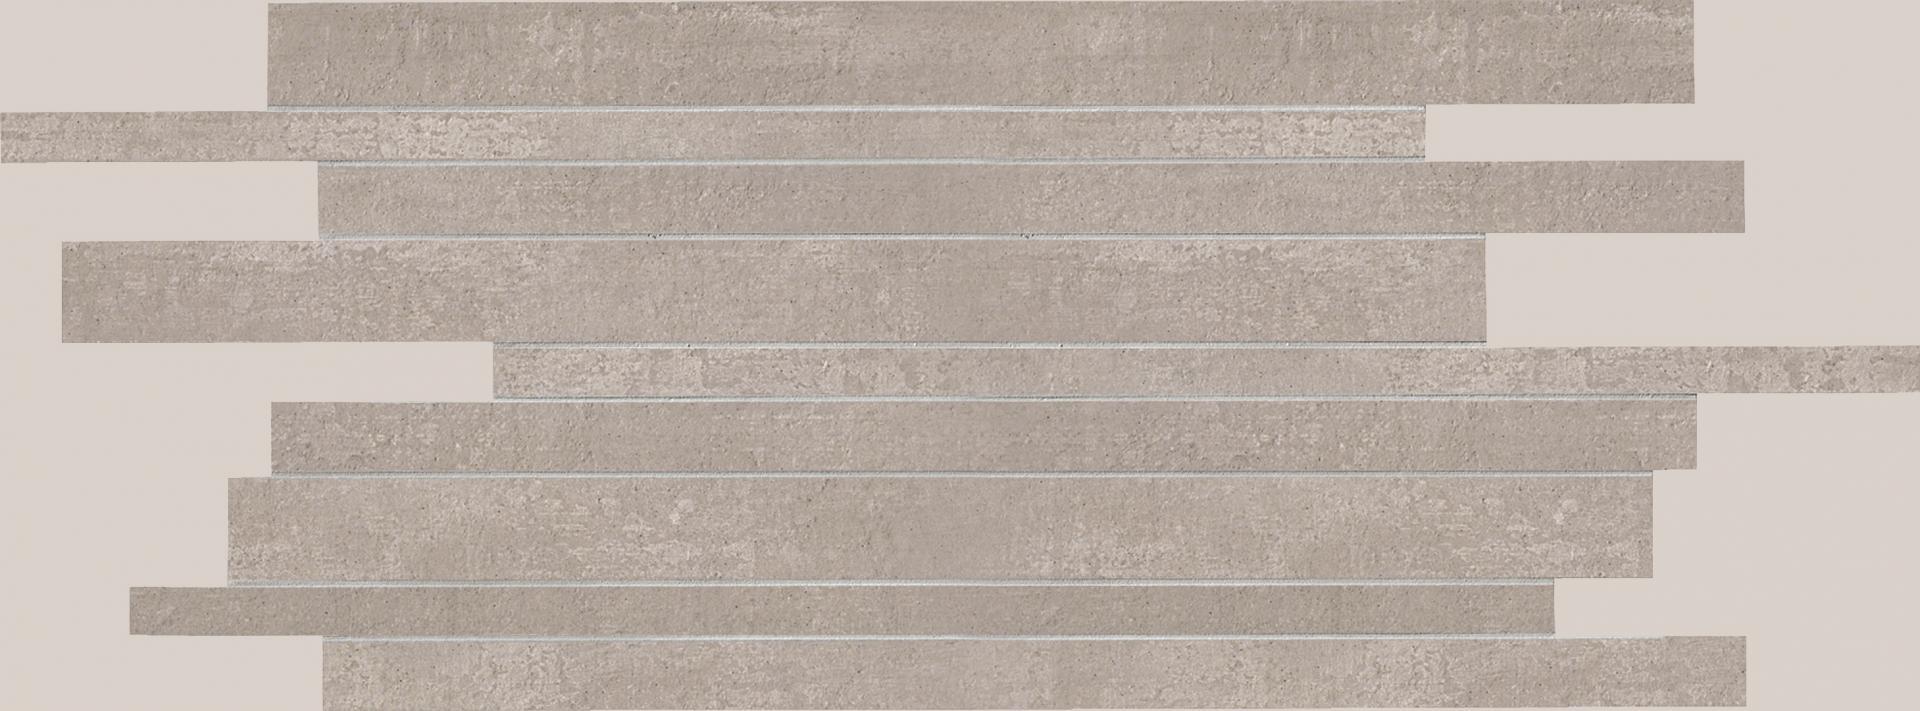 Keope LINK DESERT SAND KE-t2t3 Strips 30X60 naturale R9